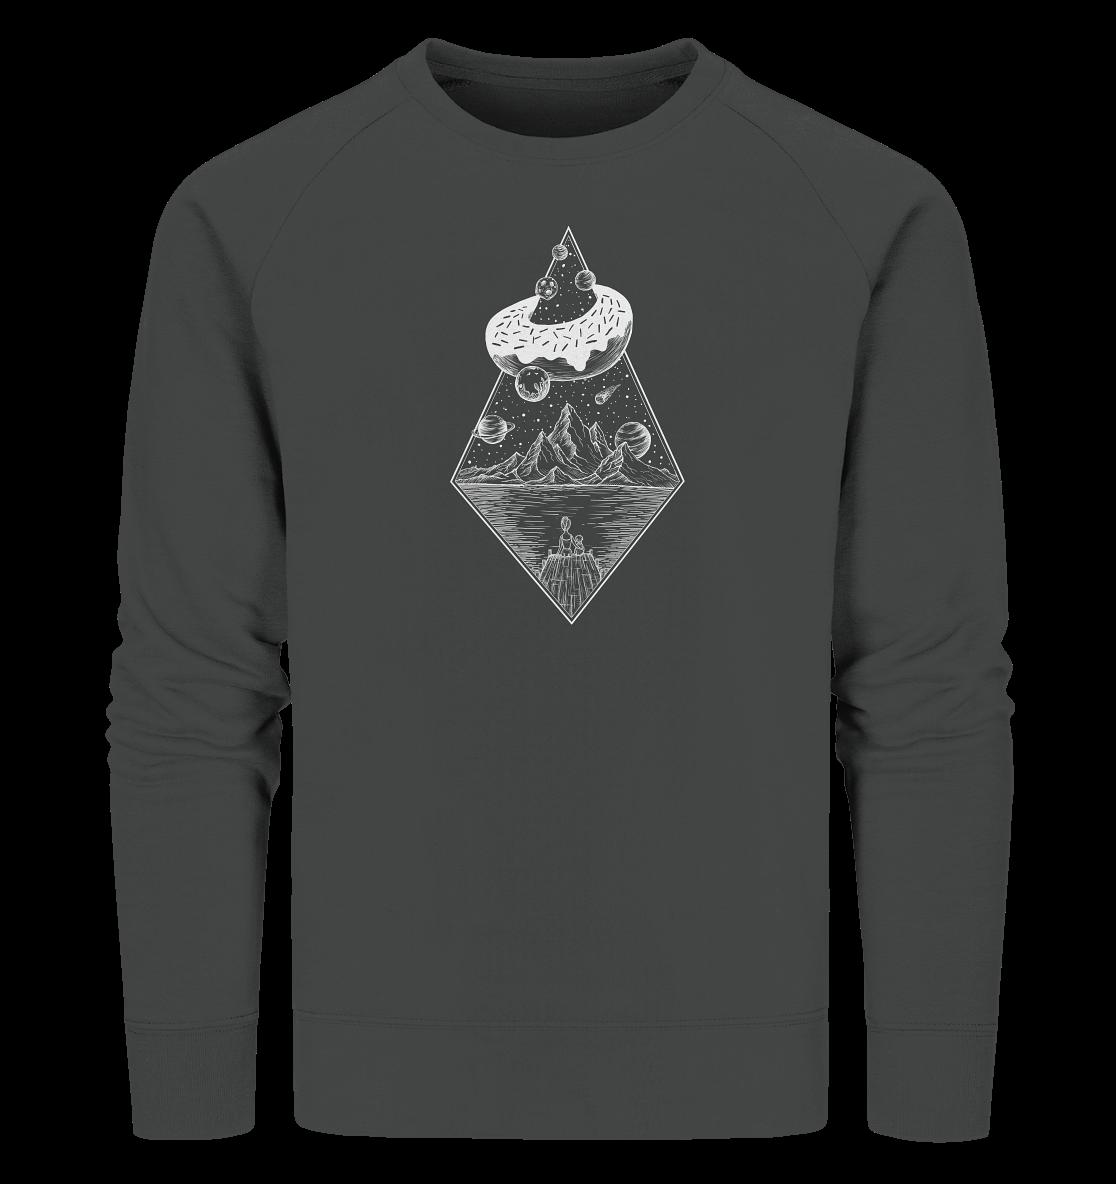 front-organic-sweatshirt-444545-1116x-1.png